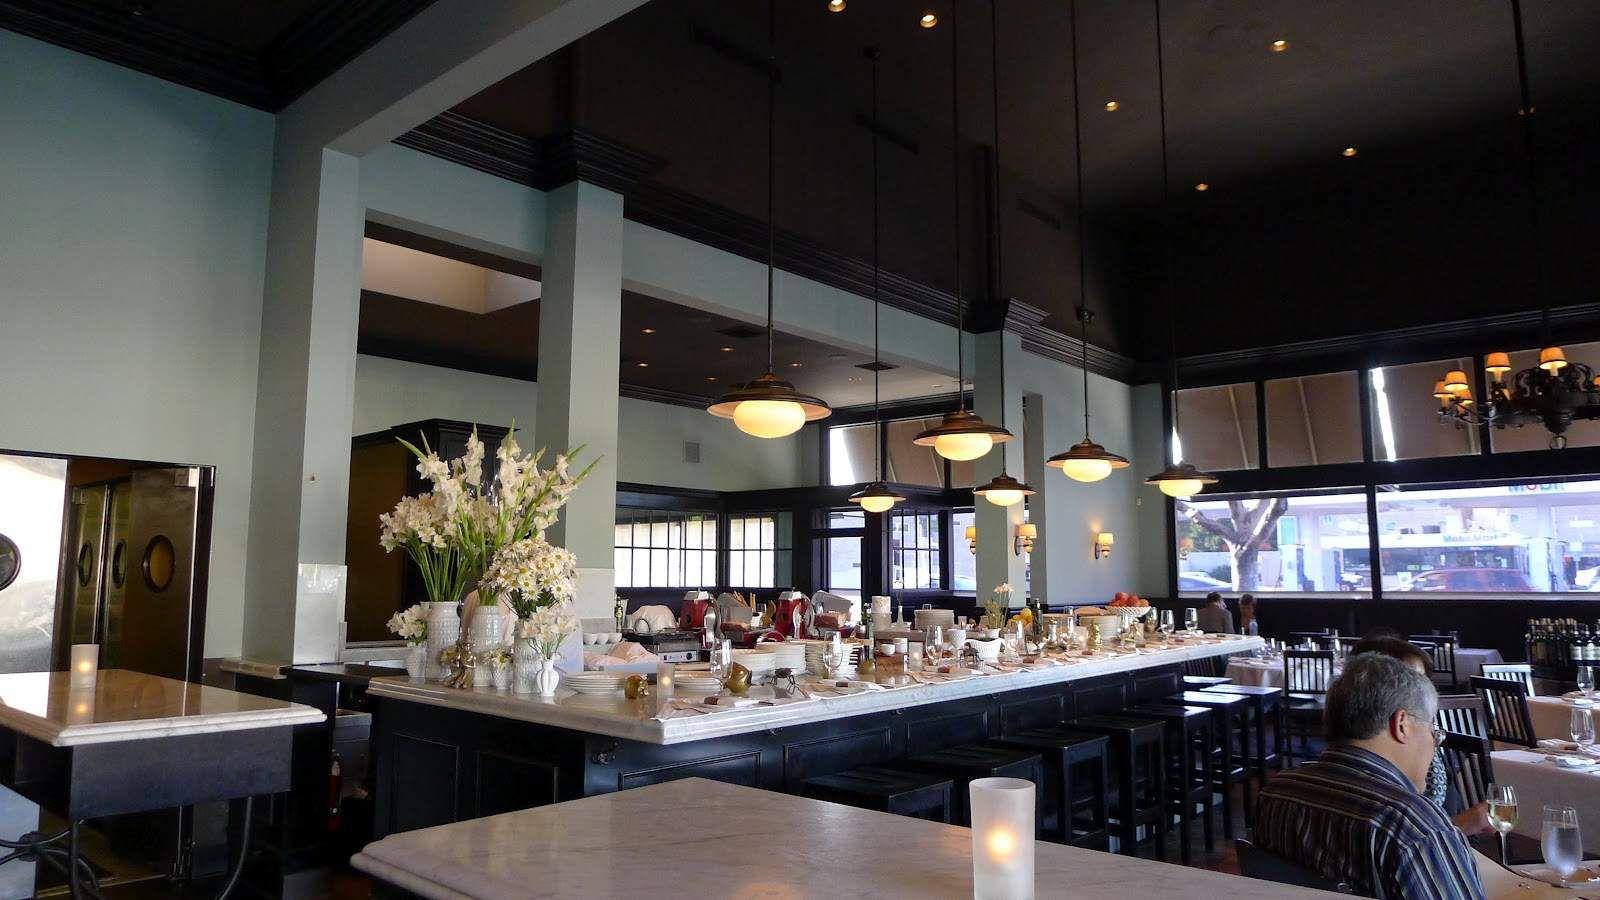 The 25 Best Italian Restaurants In America Los Angeles Restaurants Osteria Mozza Best Italian Restaurants